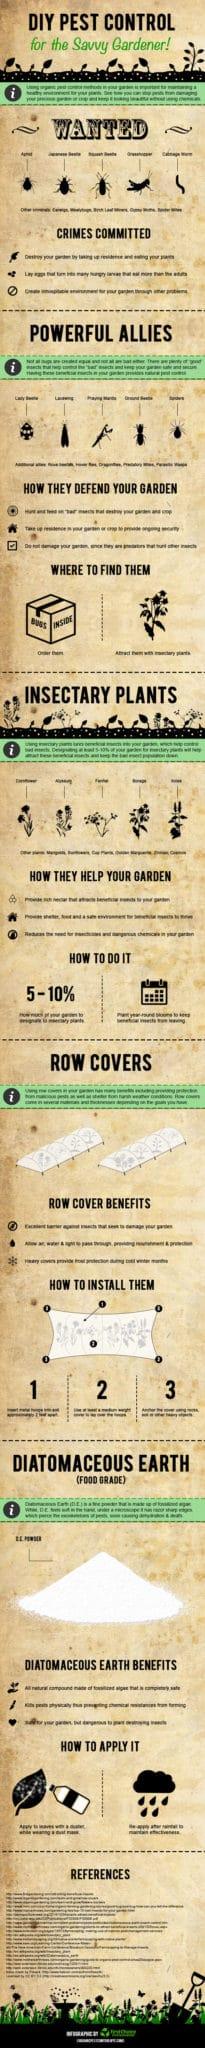 DIY organic garden pest control infographic